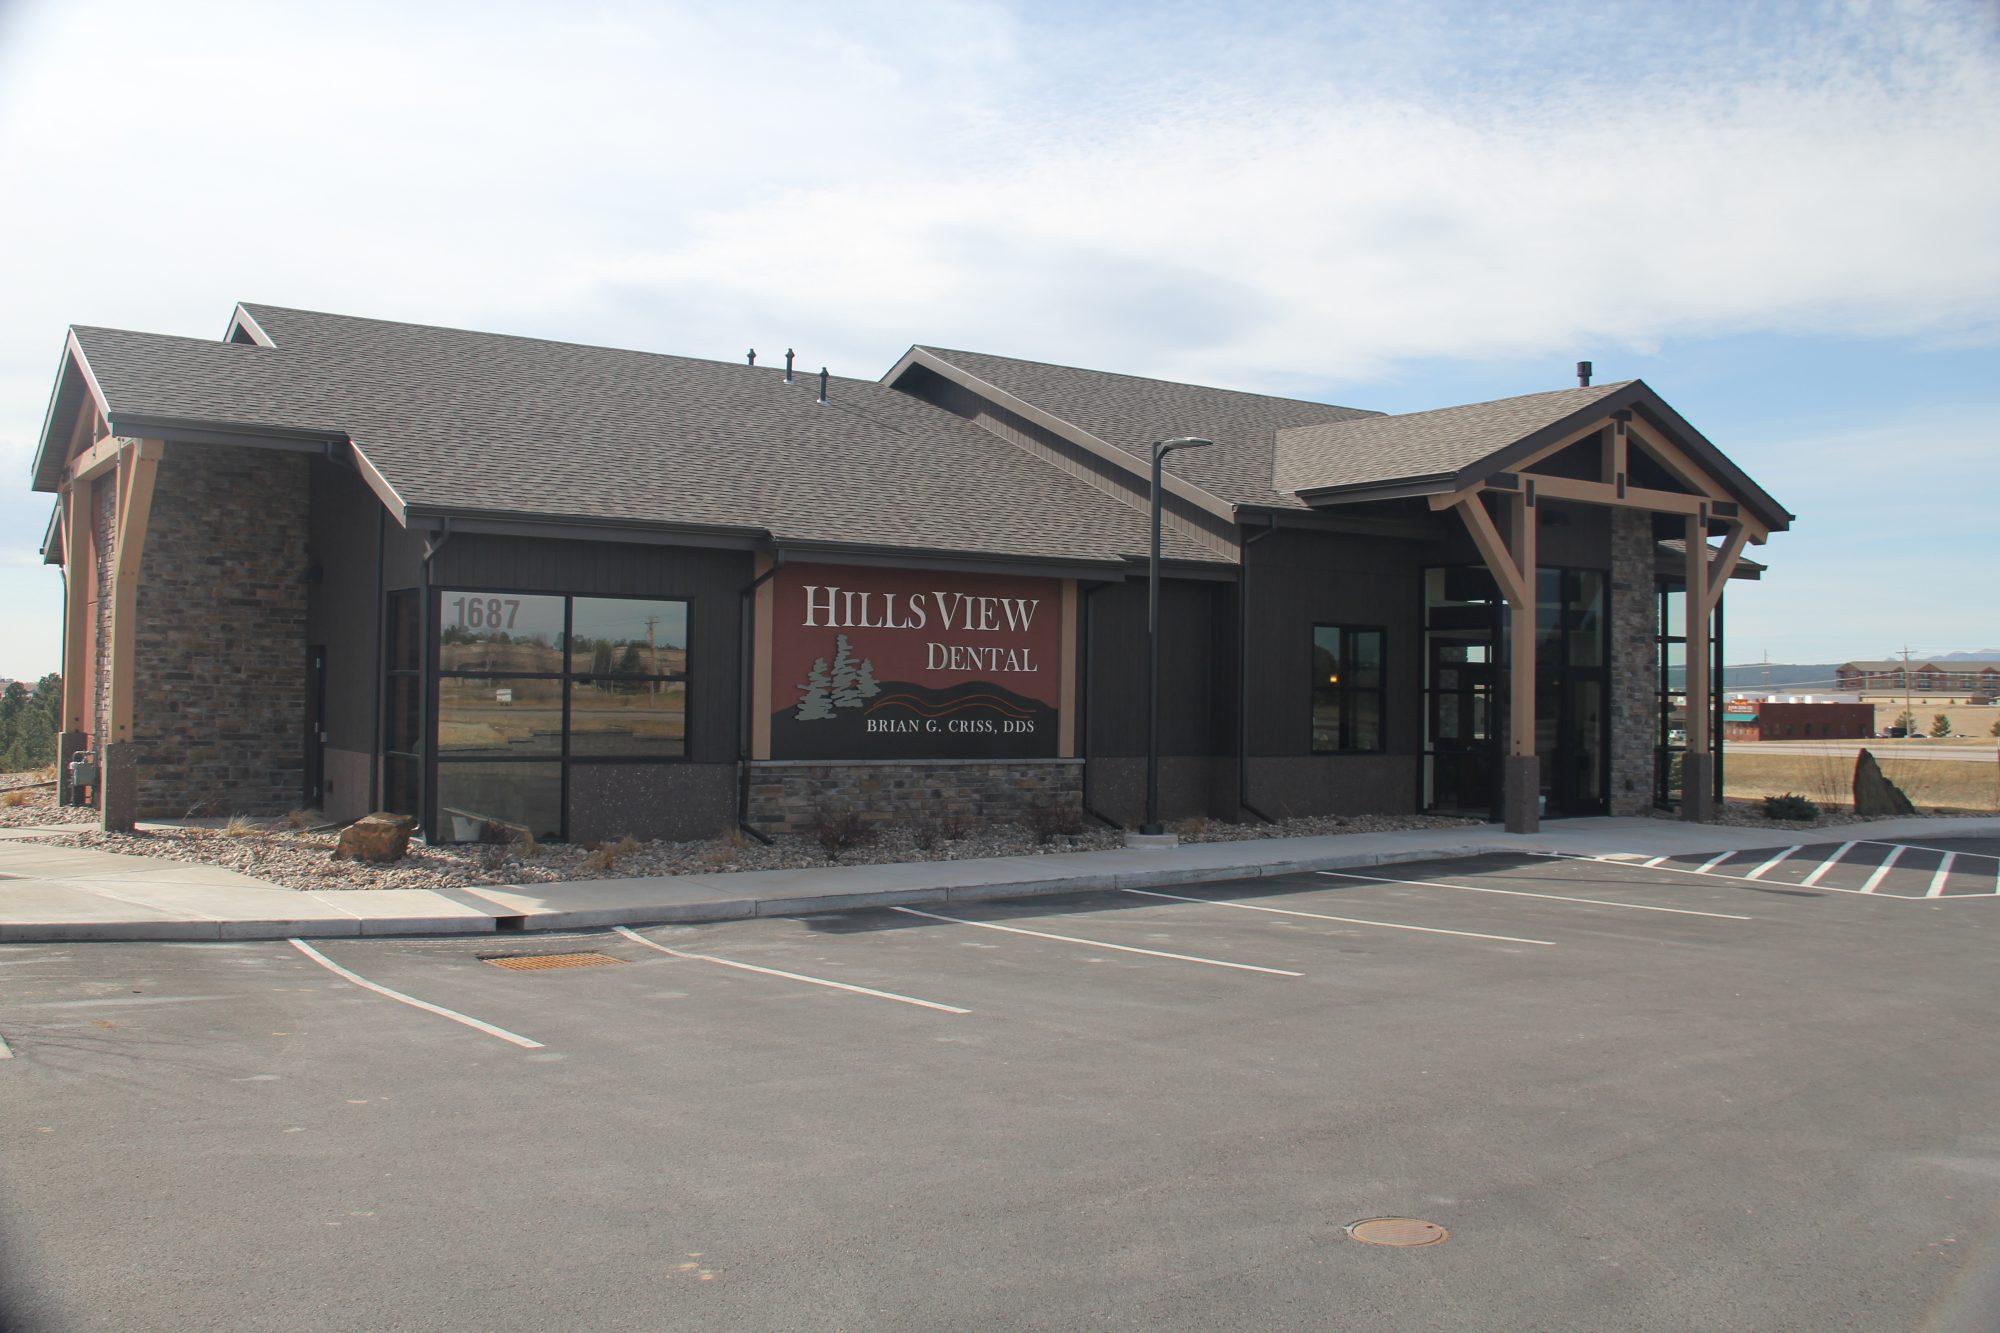 Hills View Dental Building